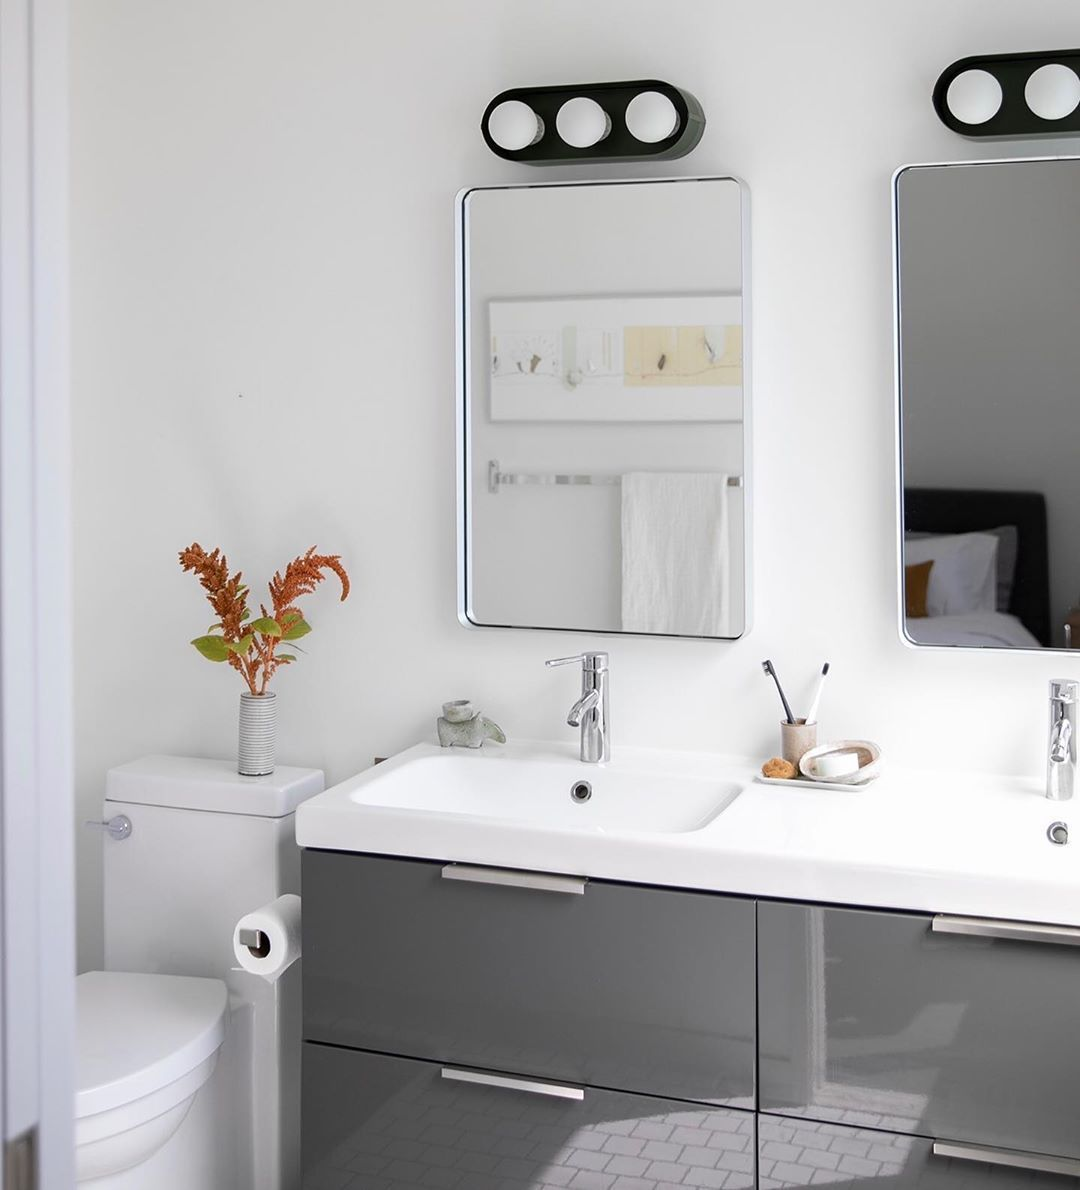 What Is Bathroom Decor Bathroom Decor Organization How To Decor Bathroom Mirror Farmhouse Bathroom Decor In 2020 Bathroom Decor Vanity Decor Black Cabinet Hardware Bathroom decor home depot